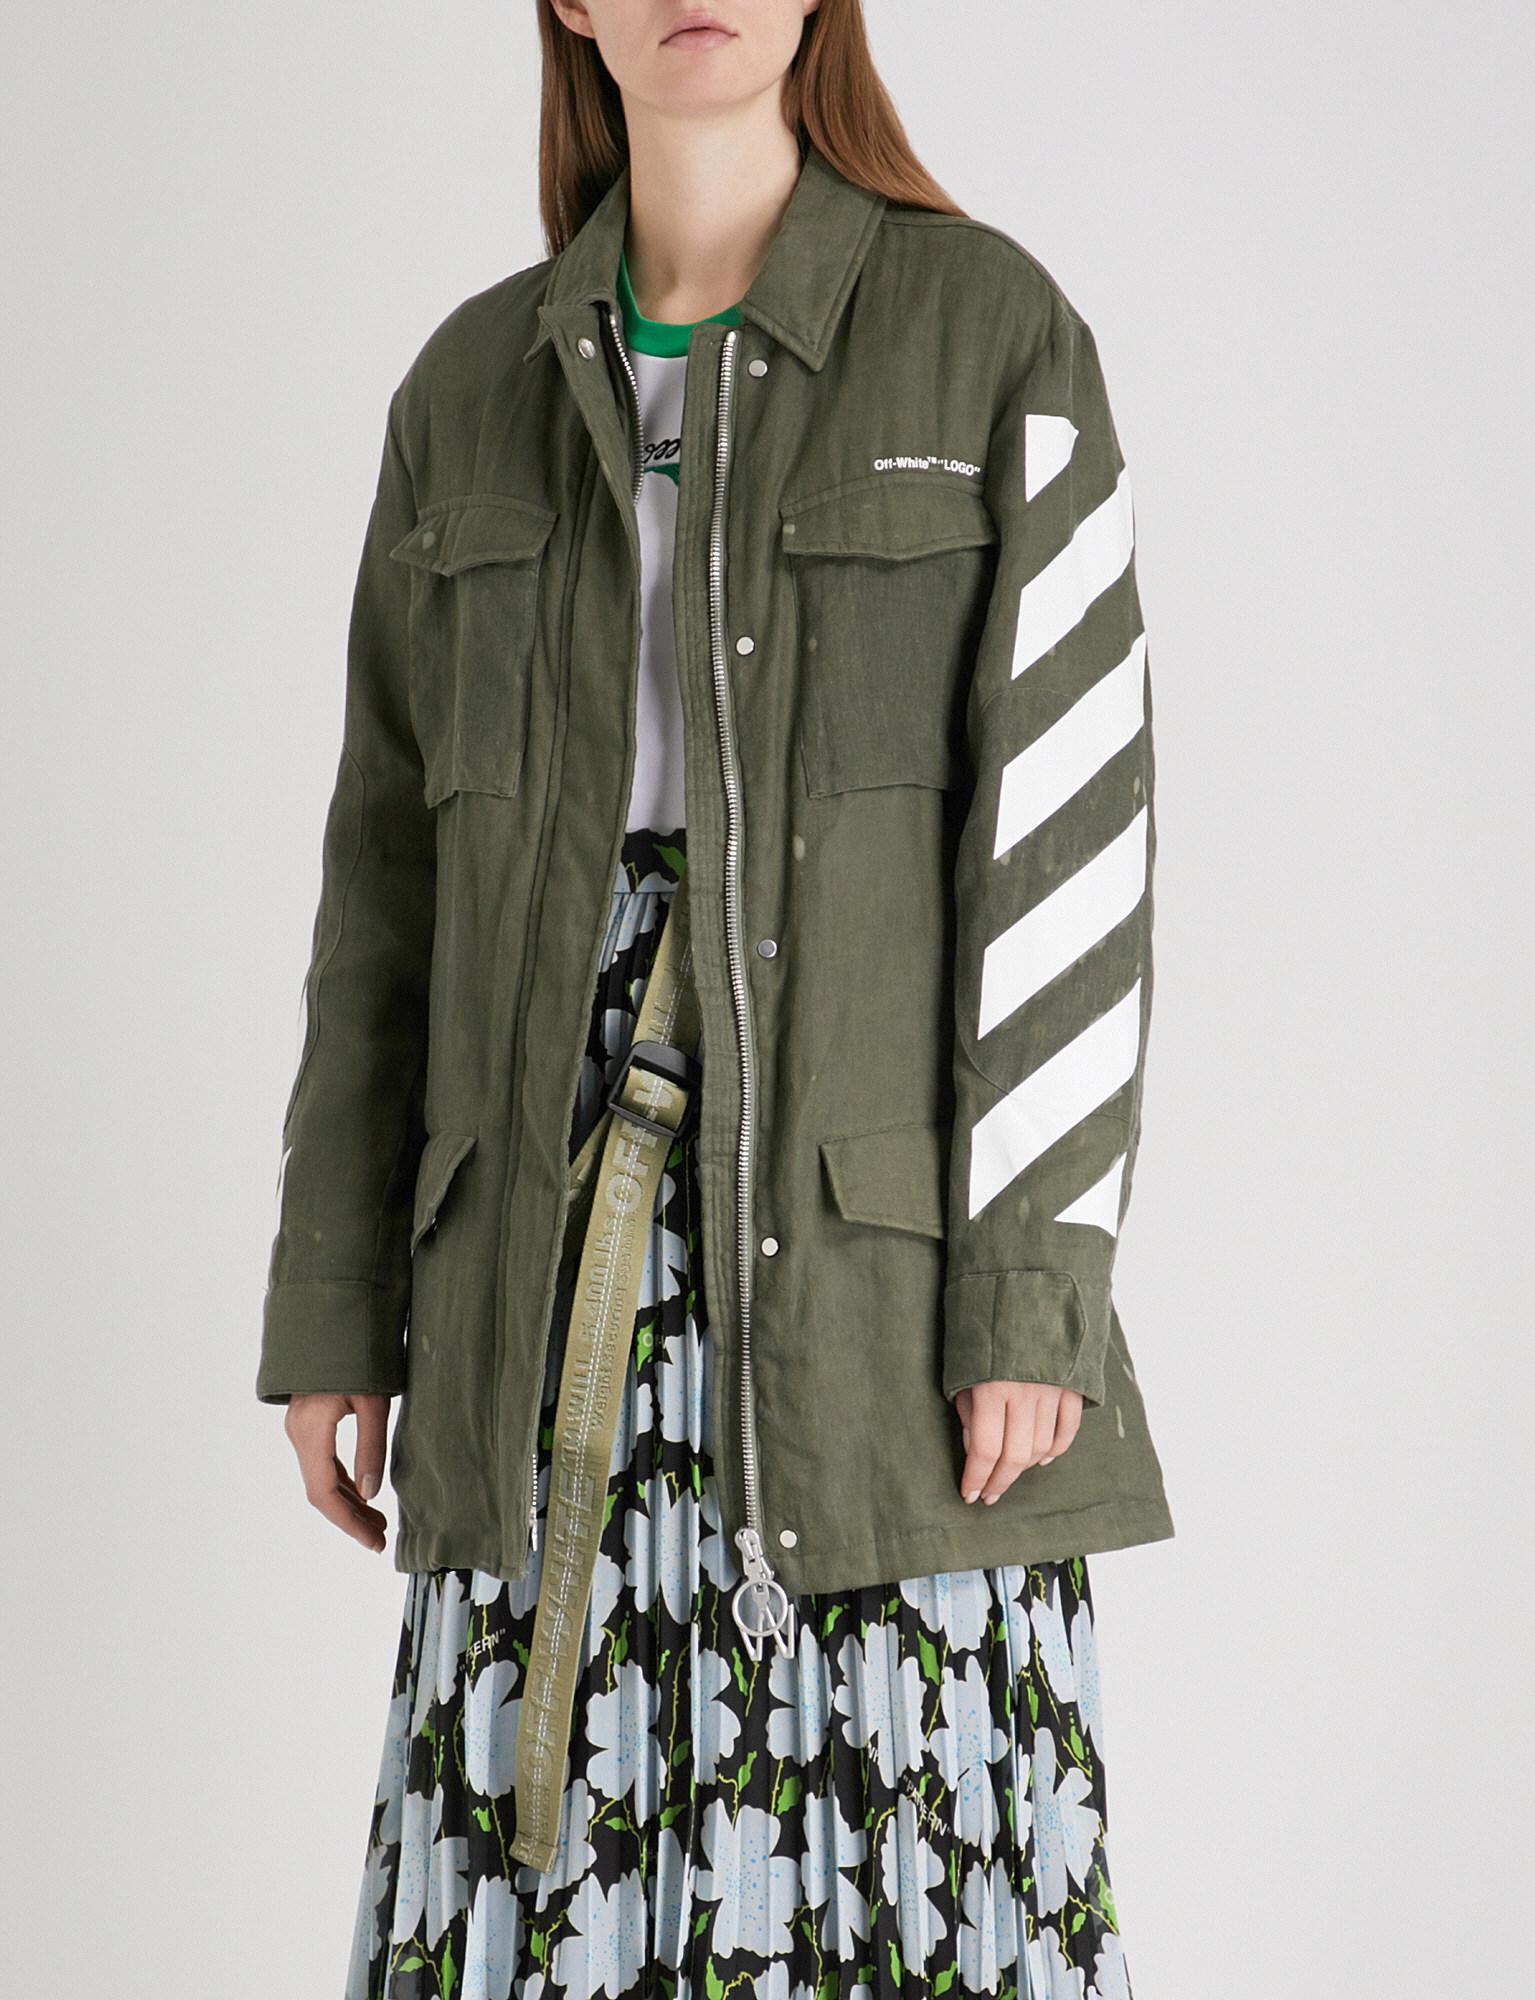 272f49f3242c Off-White c o Virgil Abloh Diagonal Stripes Linen Jacket in Green - Lyst